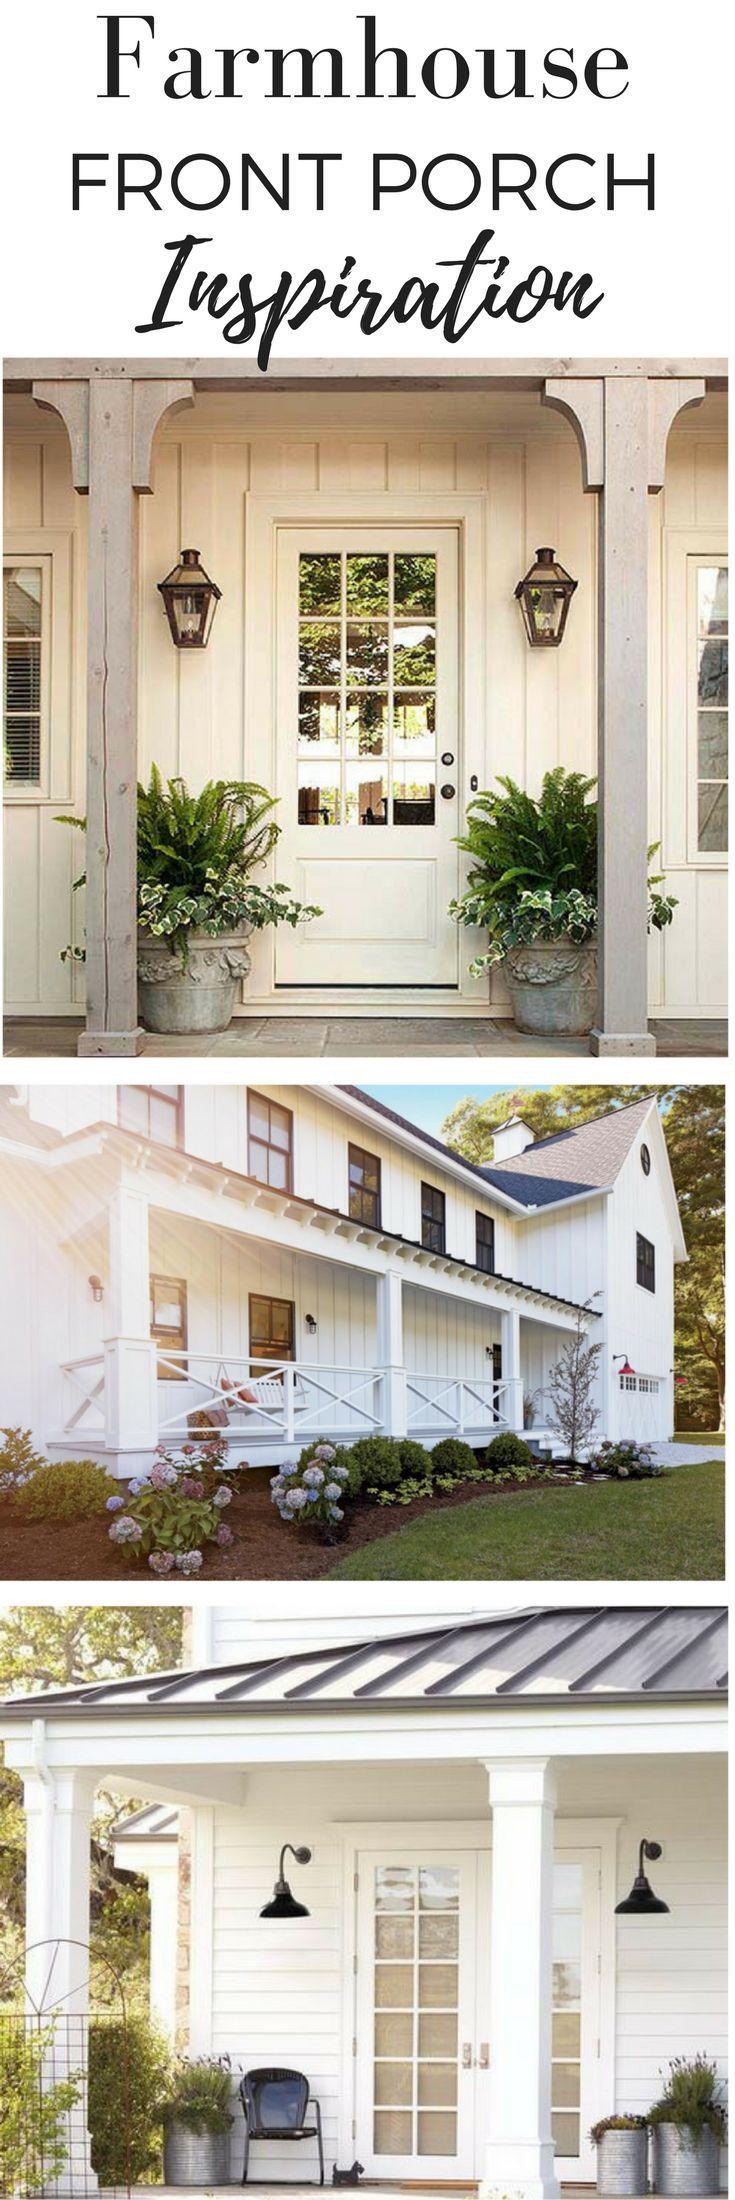 Best 25+ Farmhouse door ideas on Pinterest   Rustic farmhouse ...